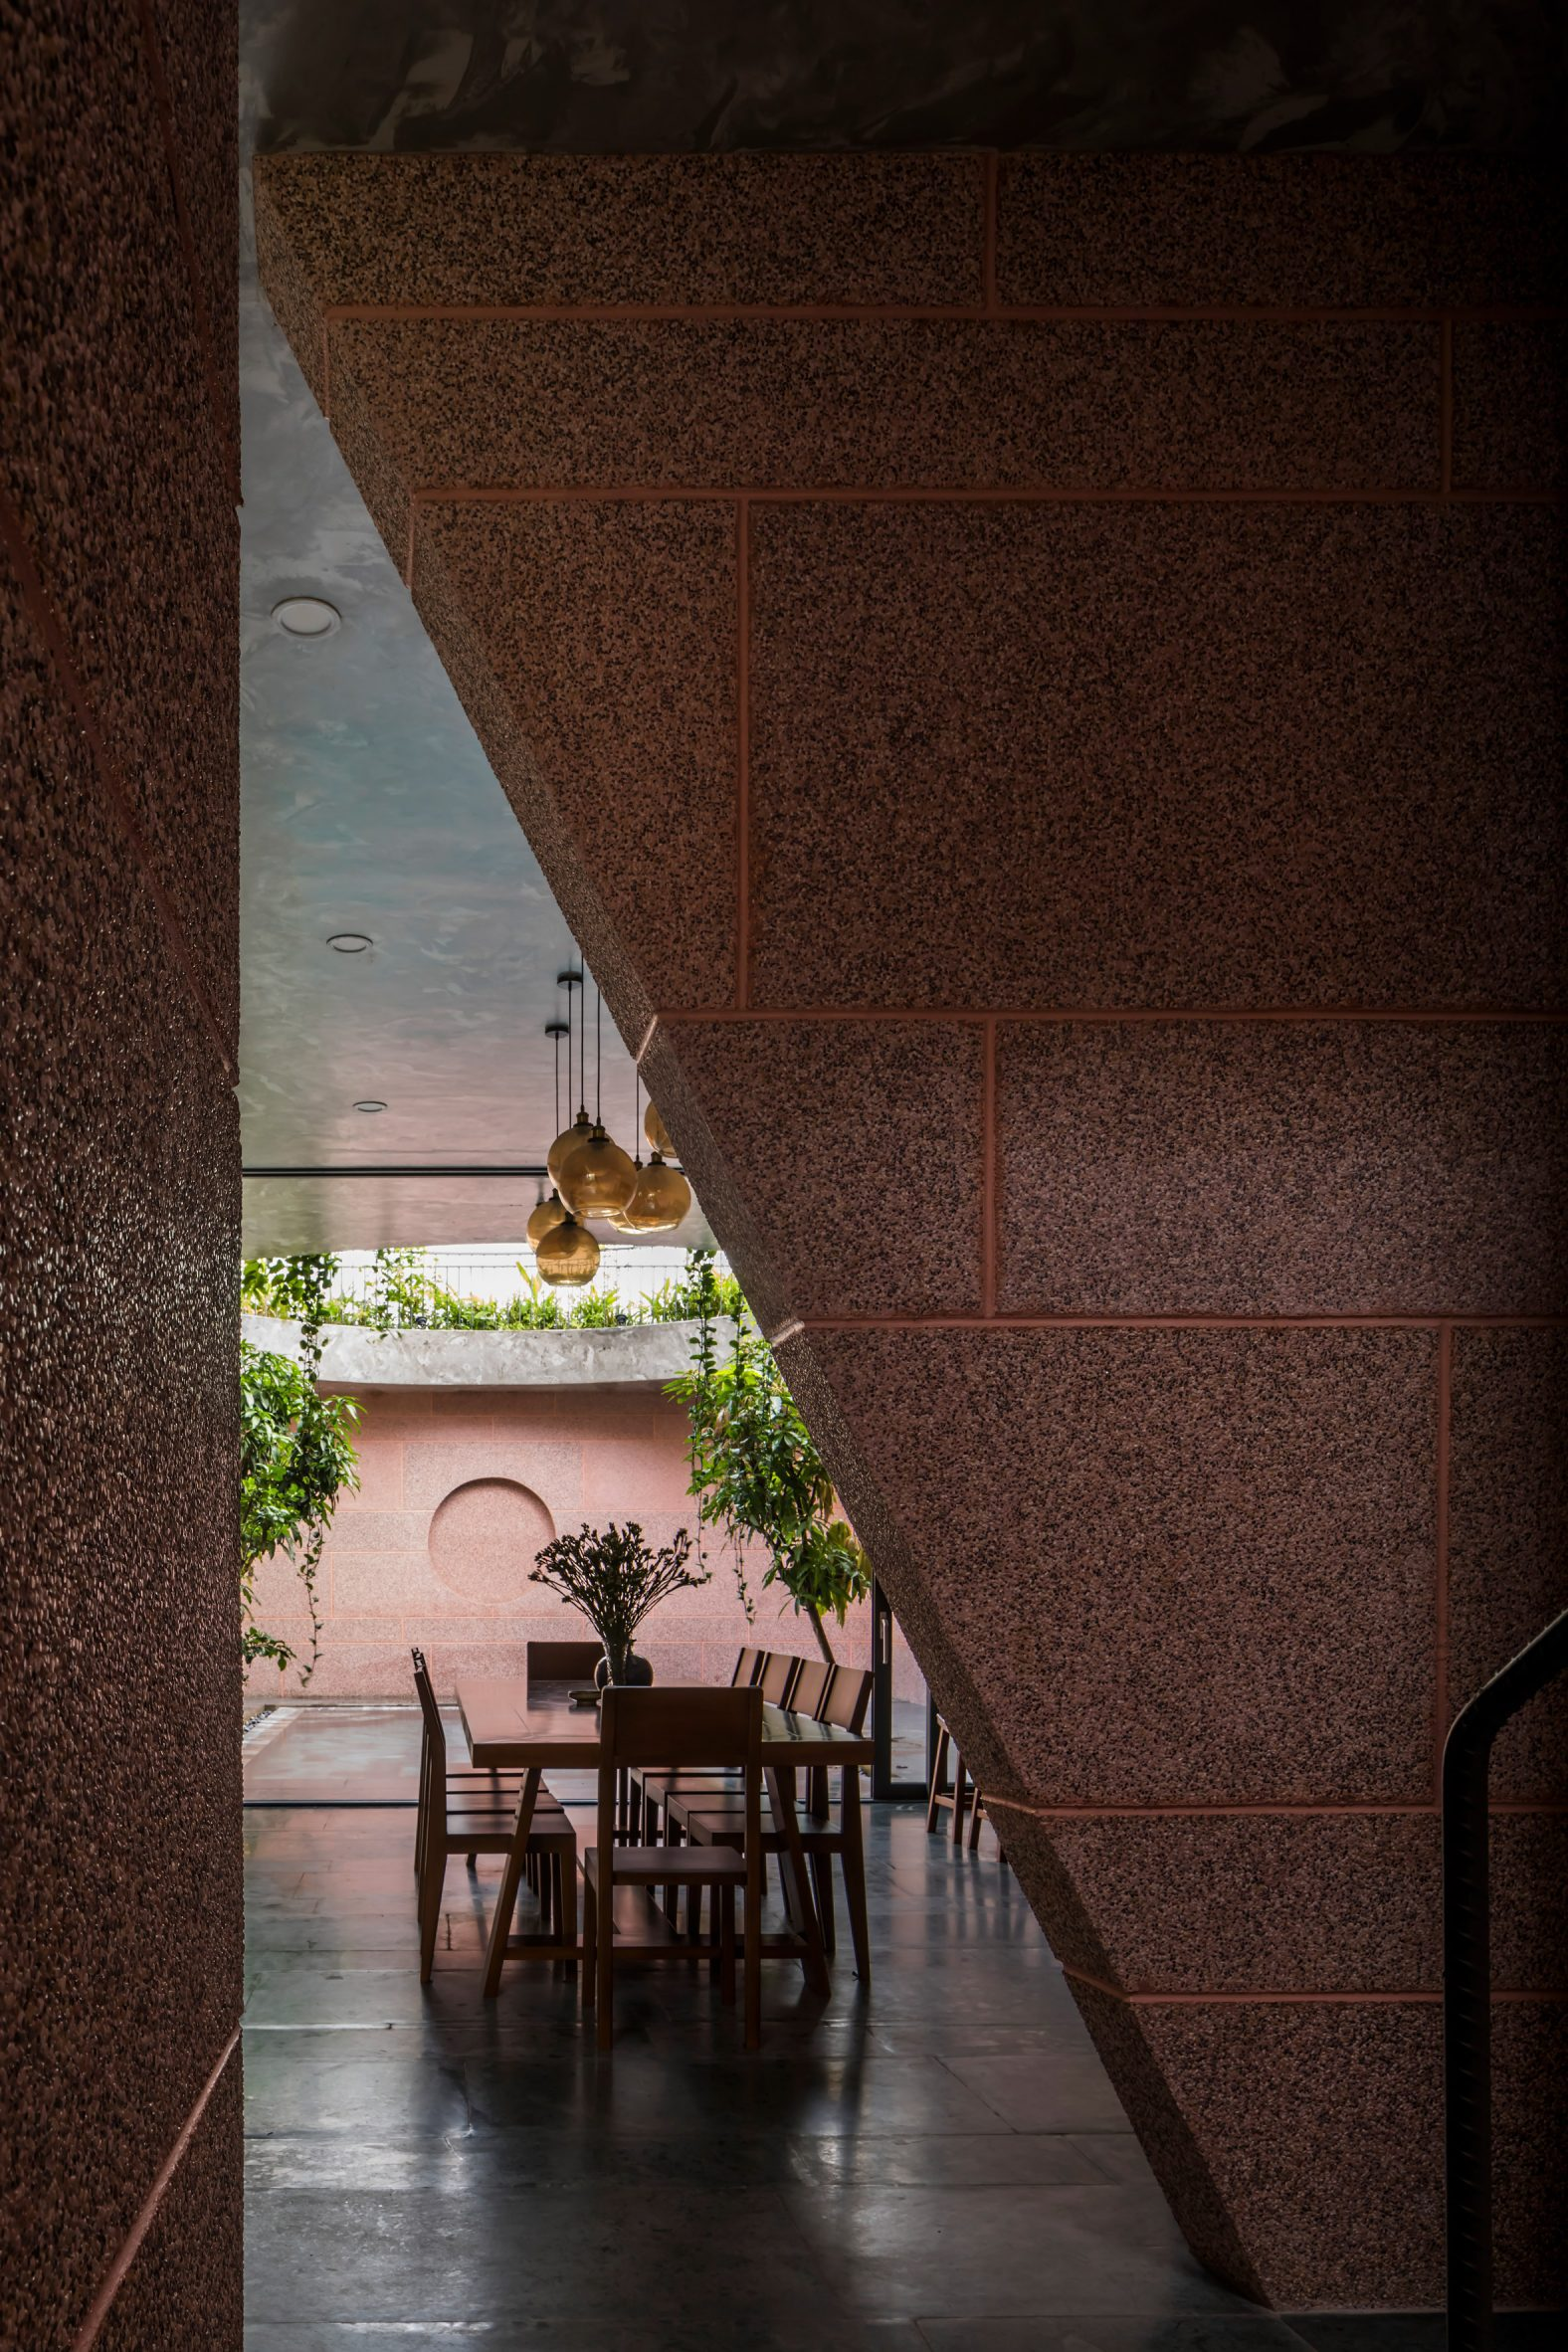 Pink house has pebble dash interior walls